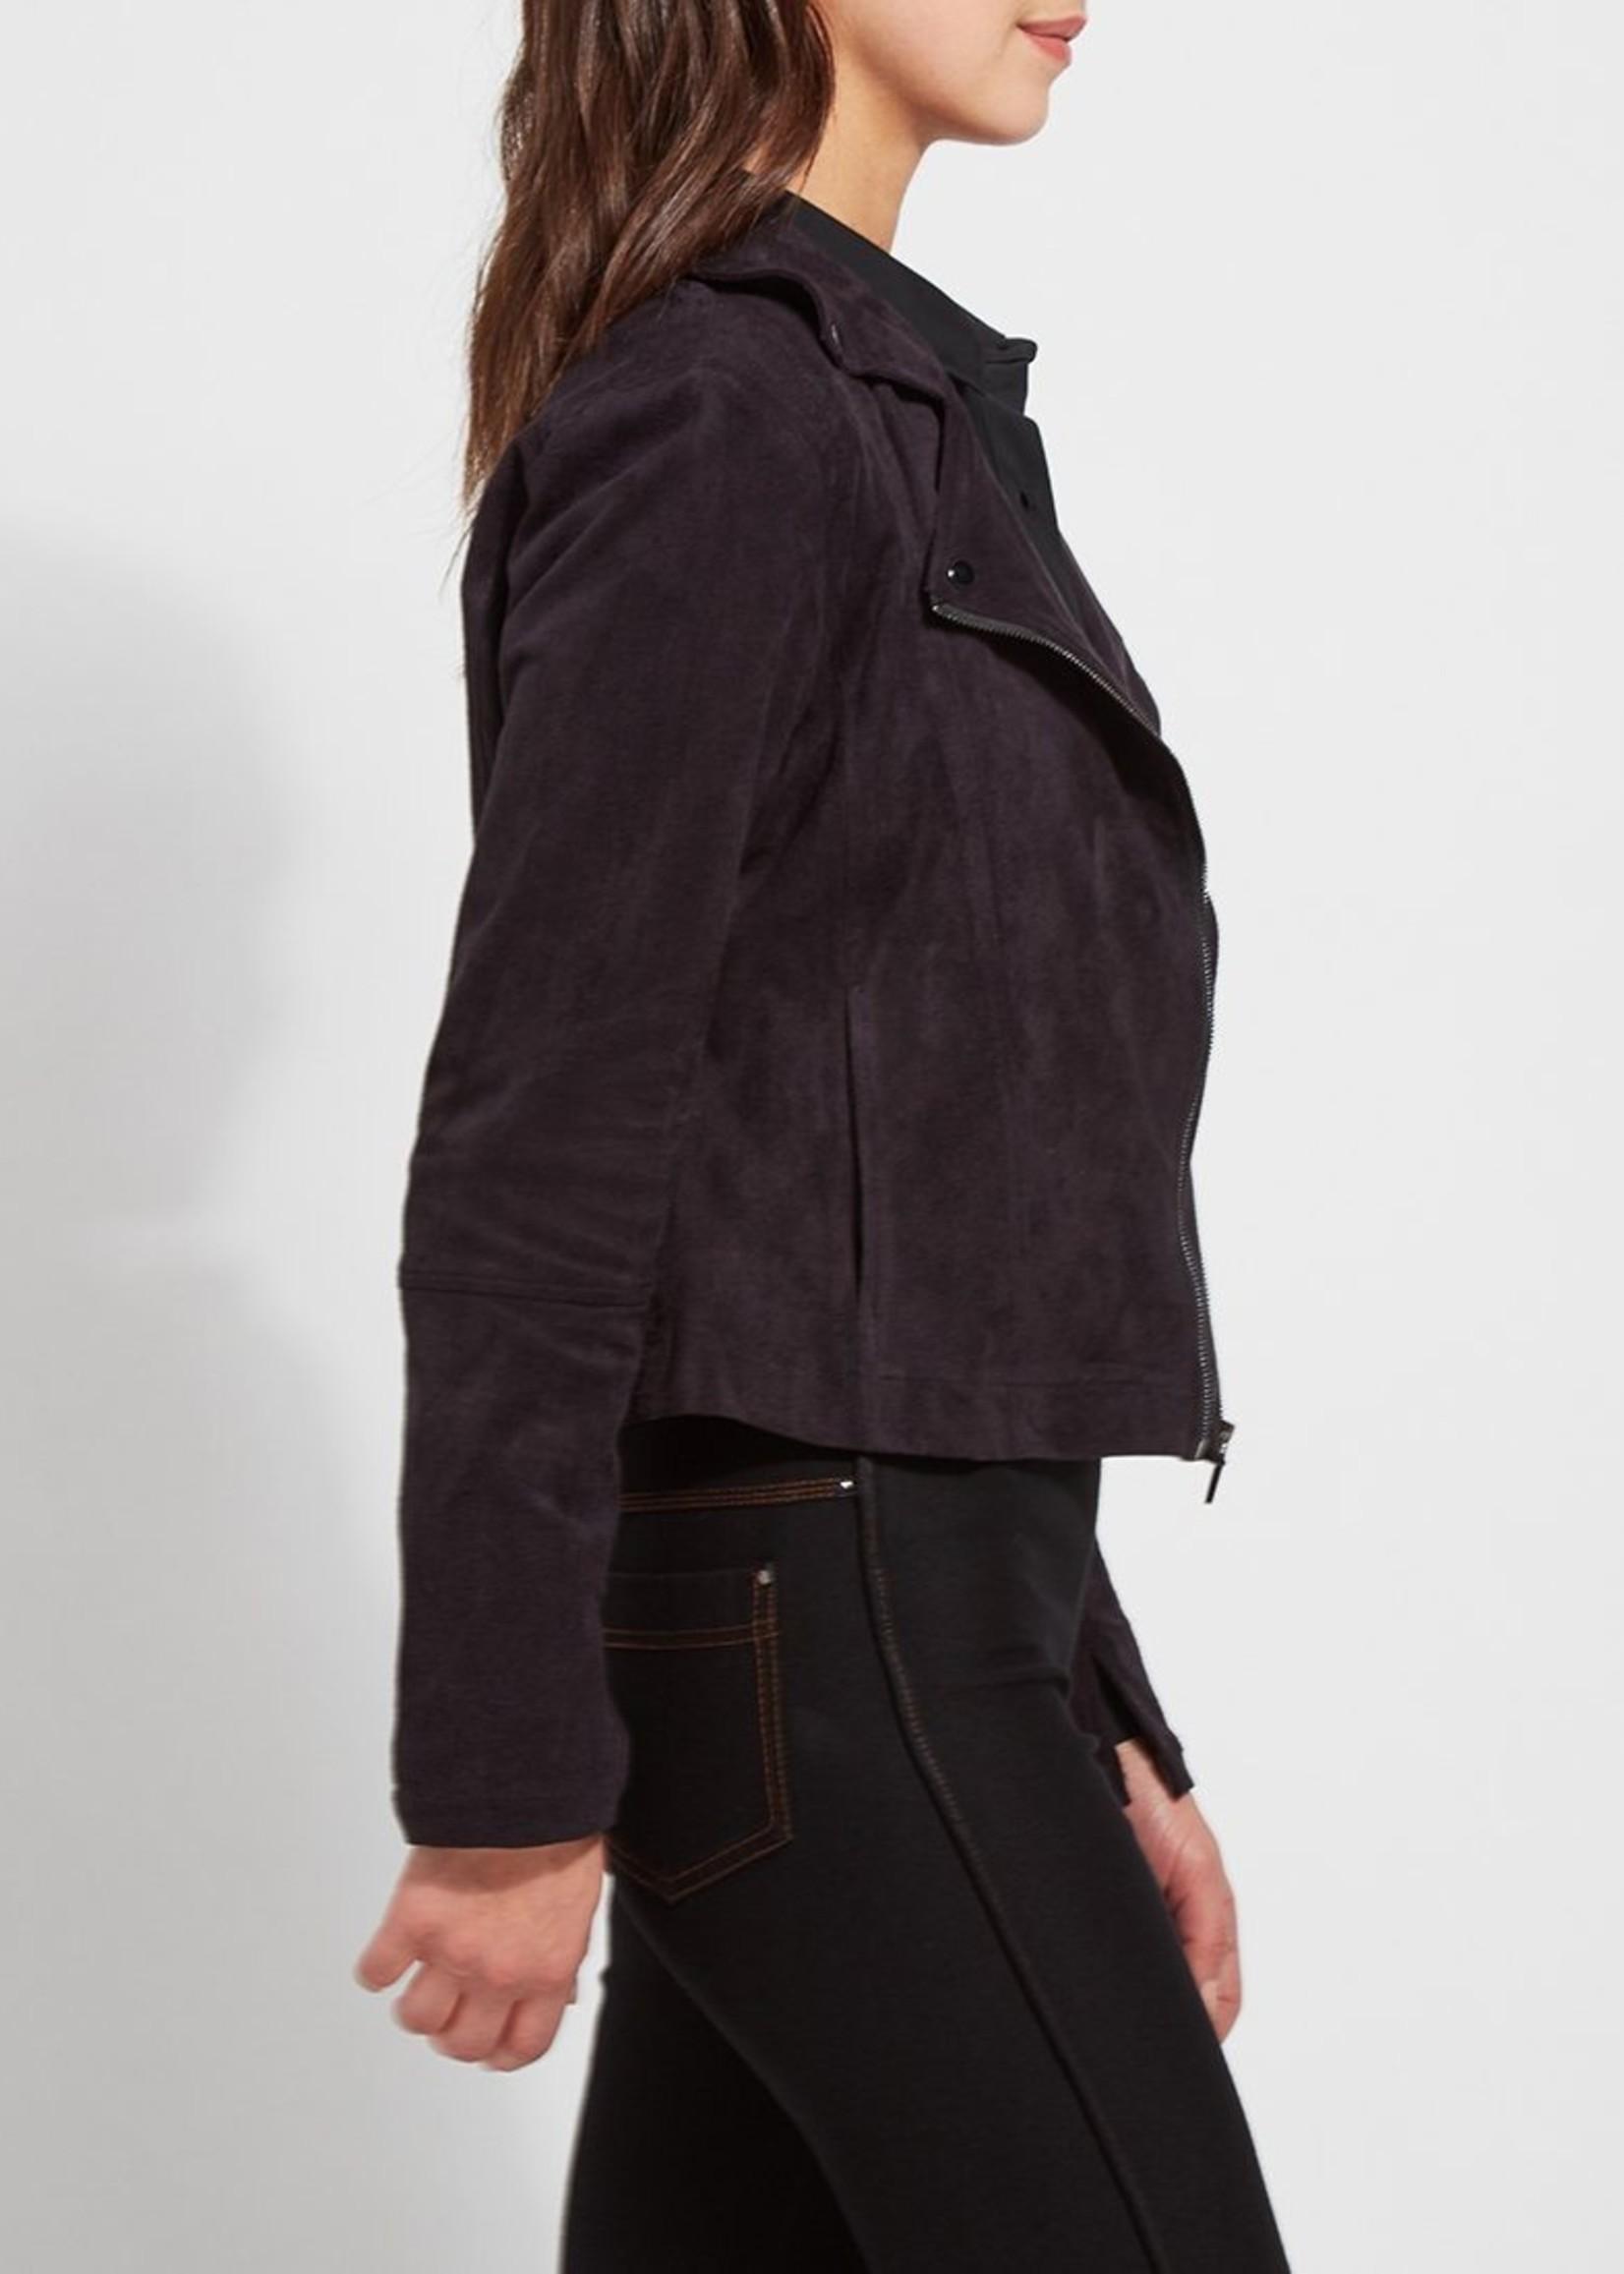 Lyssé Essential Moto Jacket